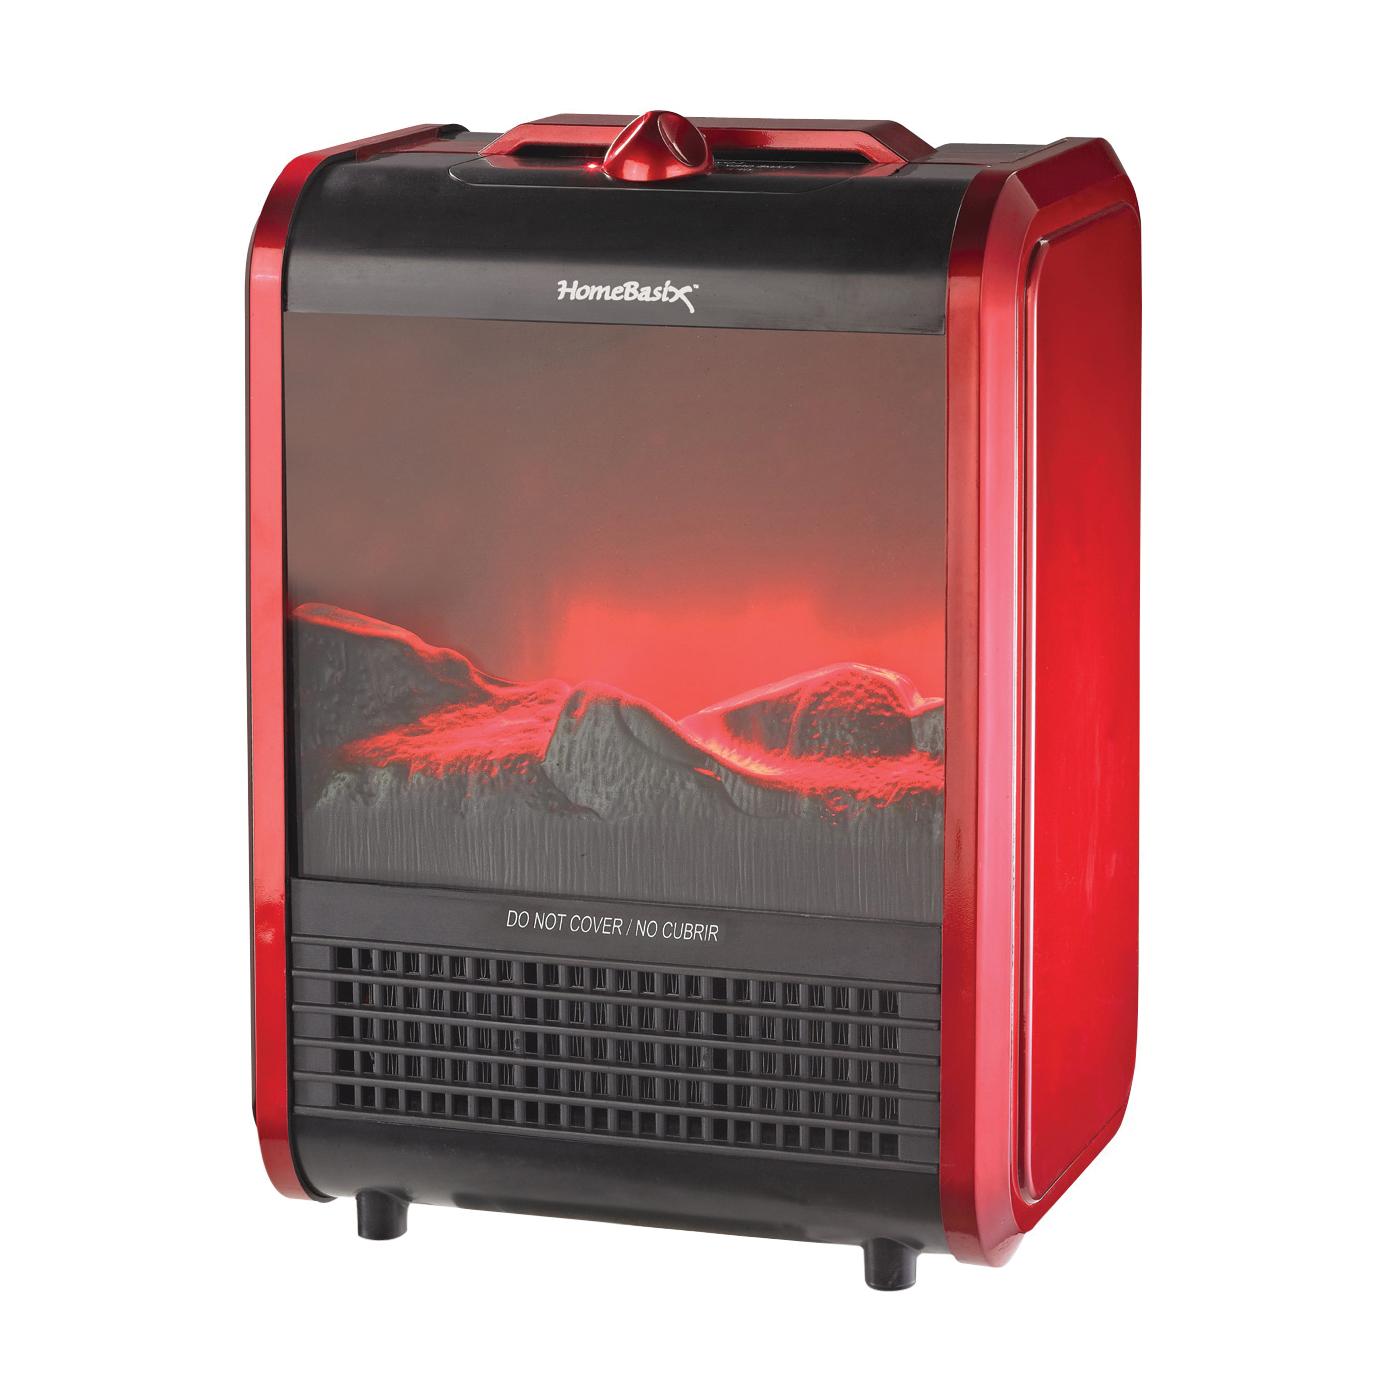 Picture of PowerZone TNP-2008I-E3 Ceramic PTC Heater 120V, 10 A, 120 V, 600/1200 W, 1200W Heating, 2-Heat Setting, Red